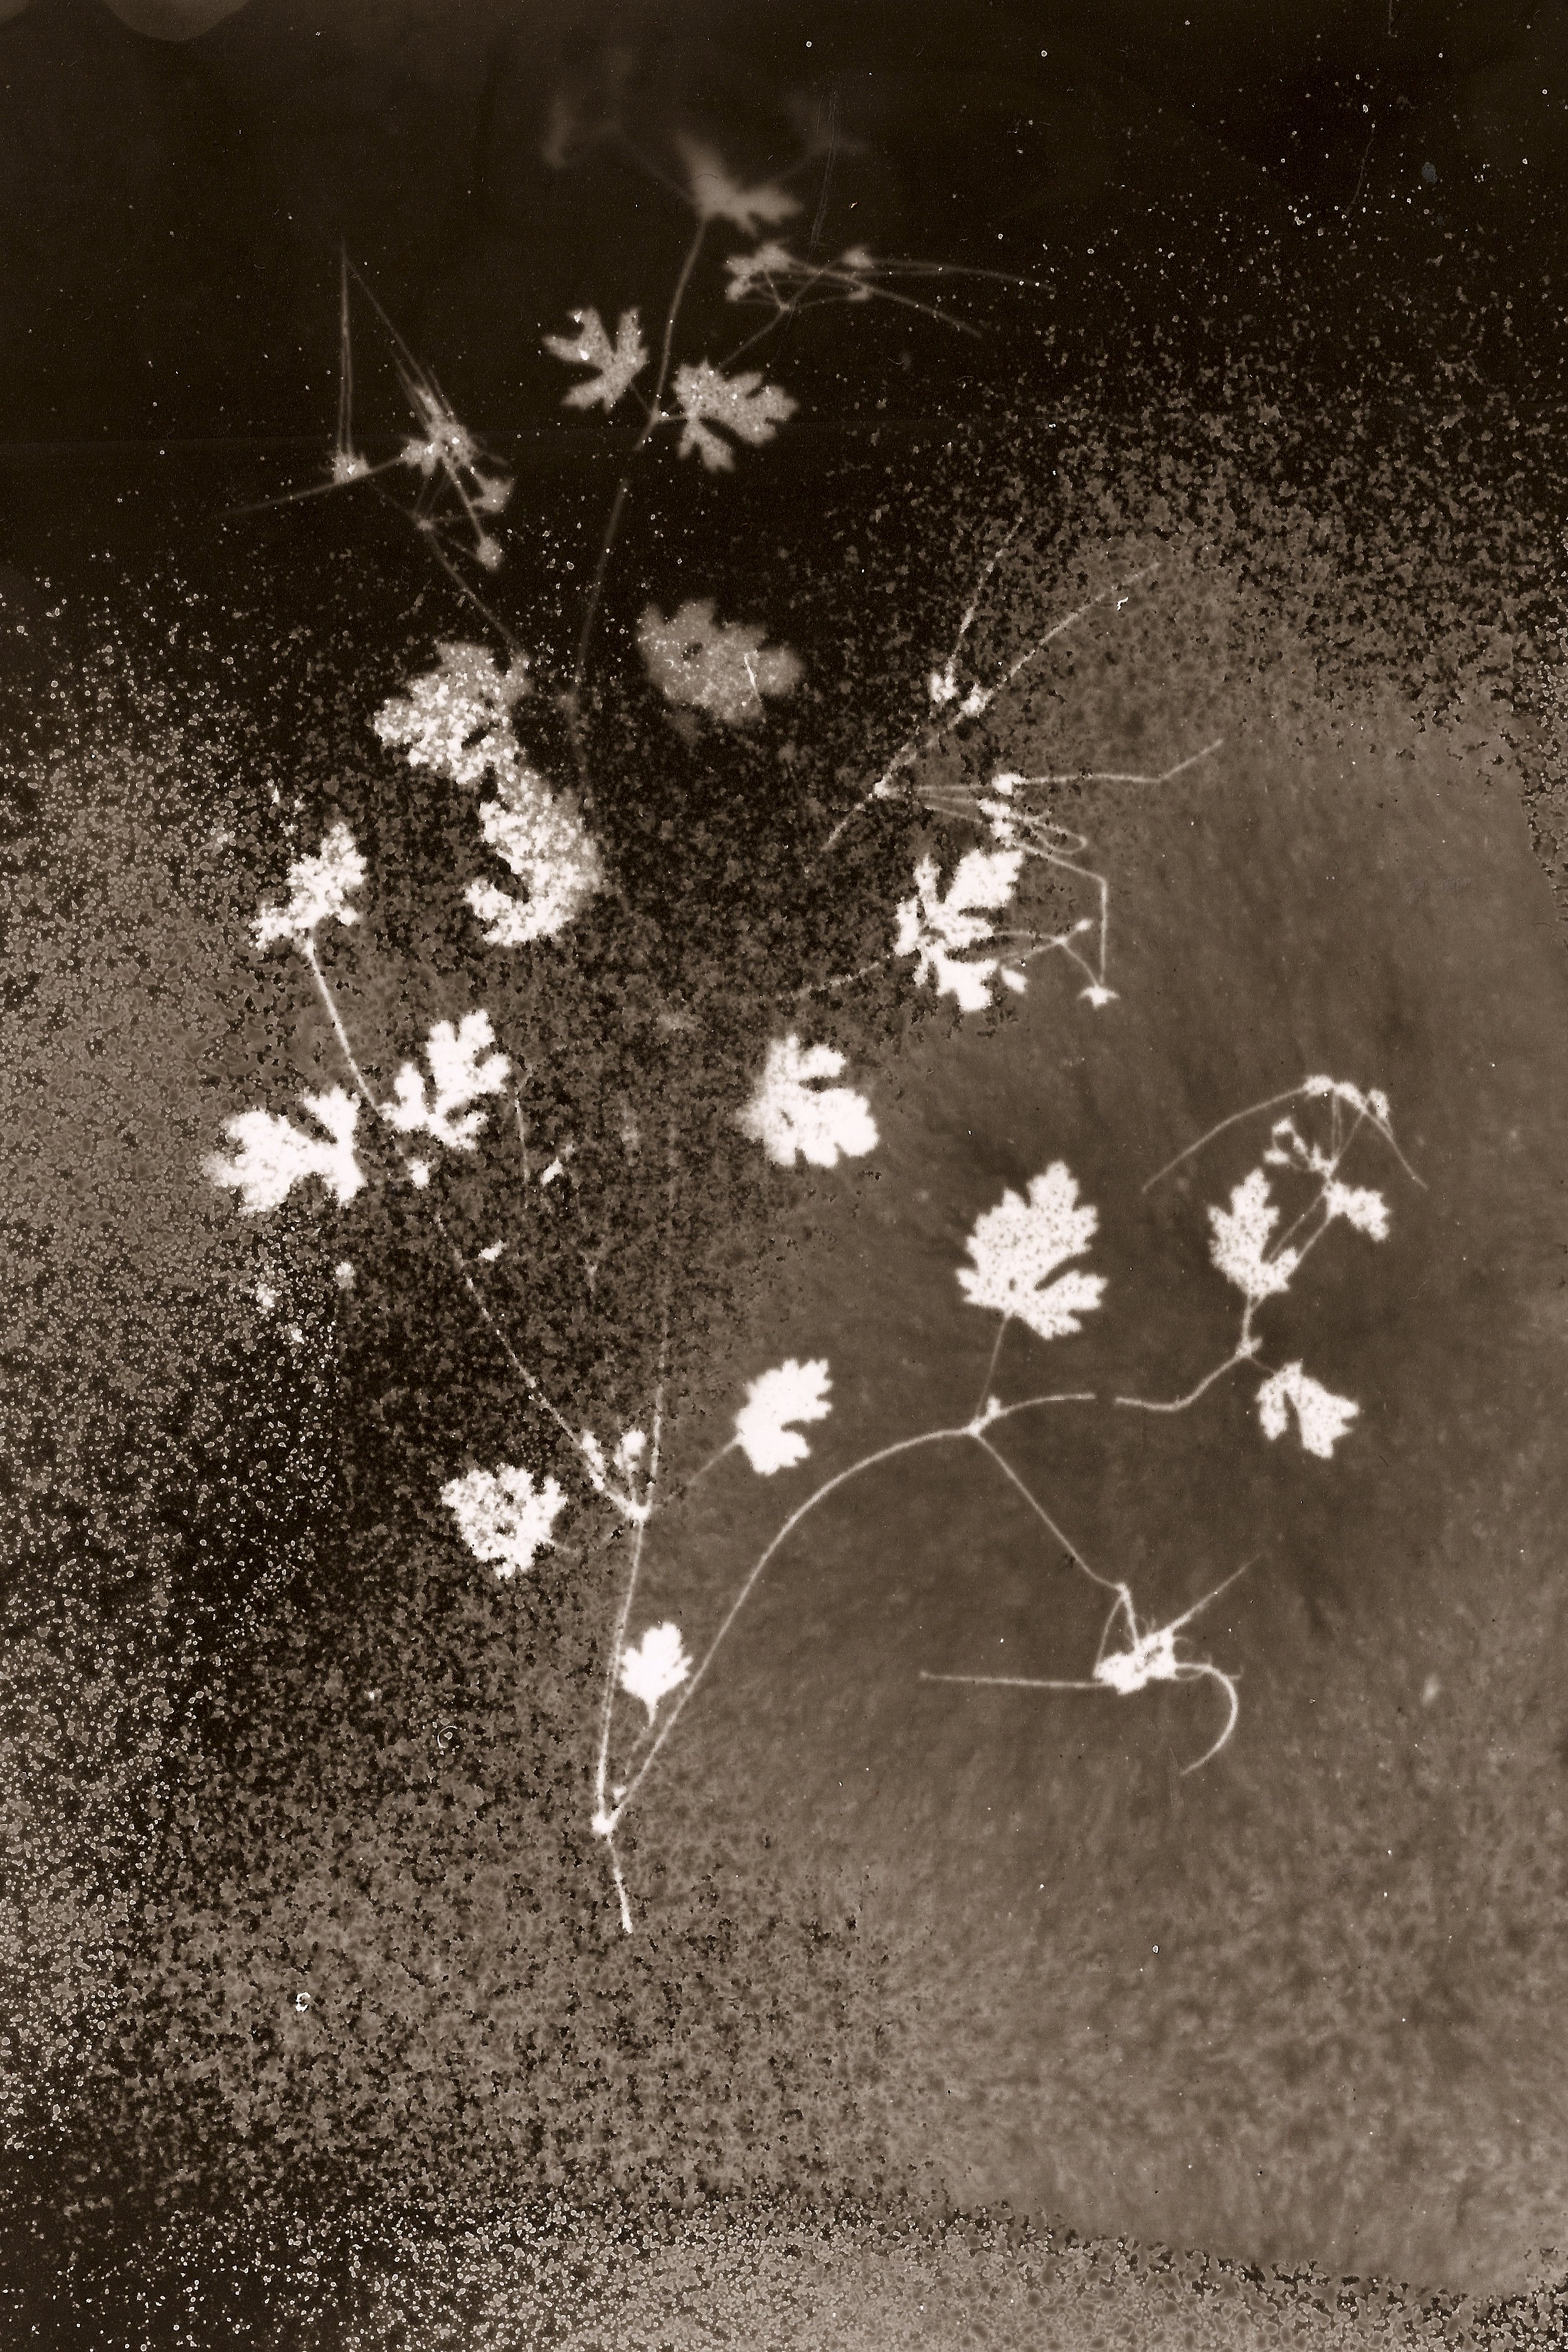 Geranium chinum,  fotograma en papel de algodón, 2011-2016 Zona de exclusión de Chernóbil, Ucrania Nivel de radiación: 1.7 microsieverts/h (por Anaïs Tondeur)